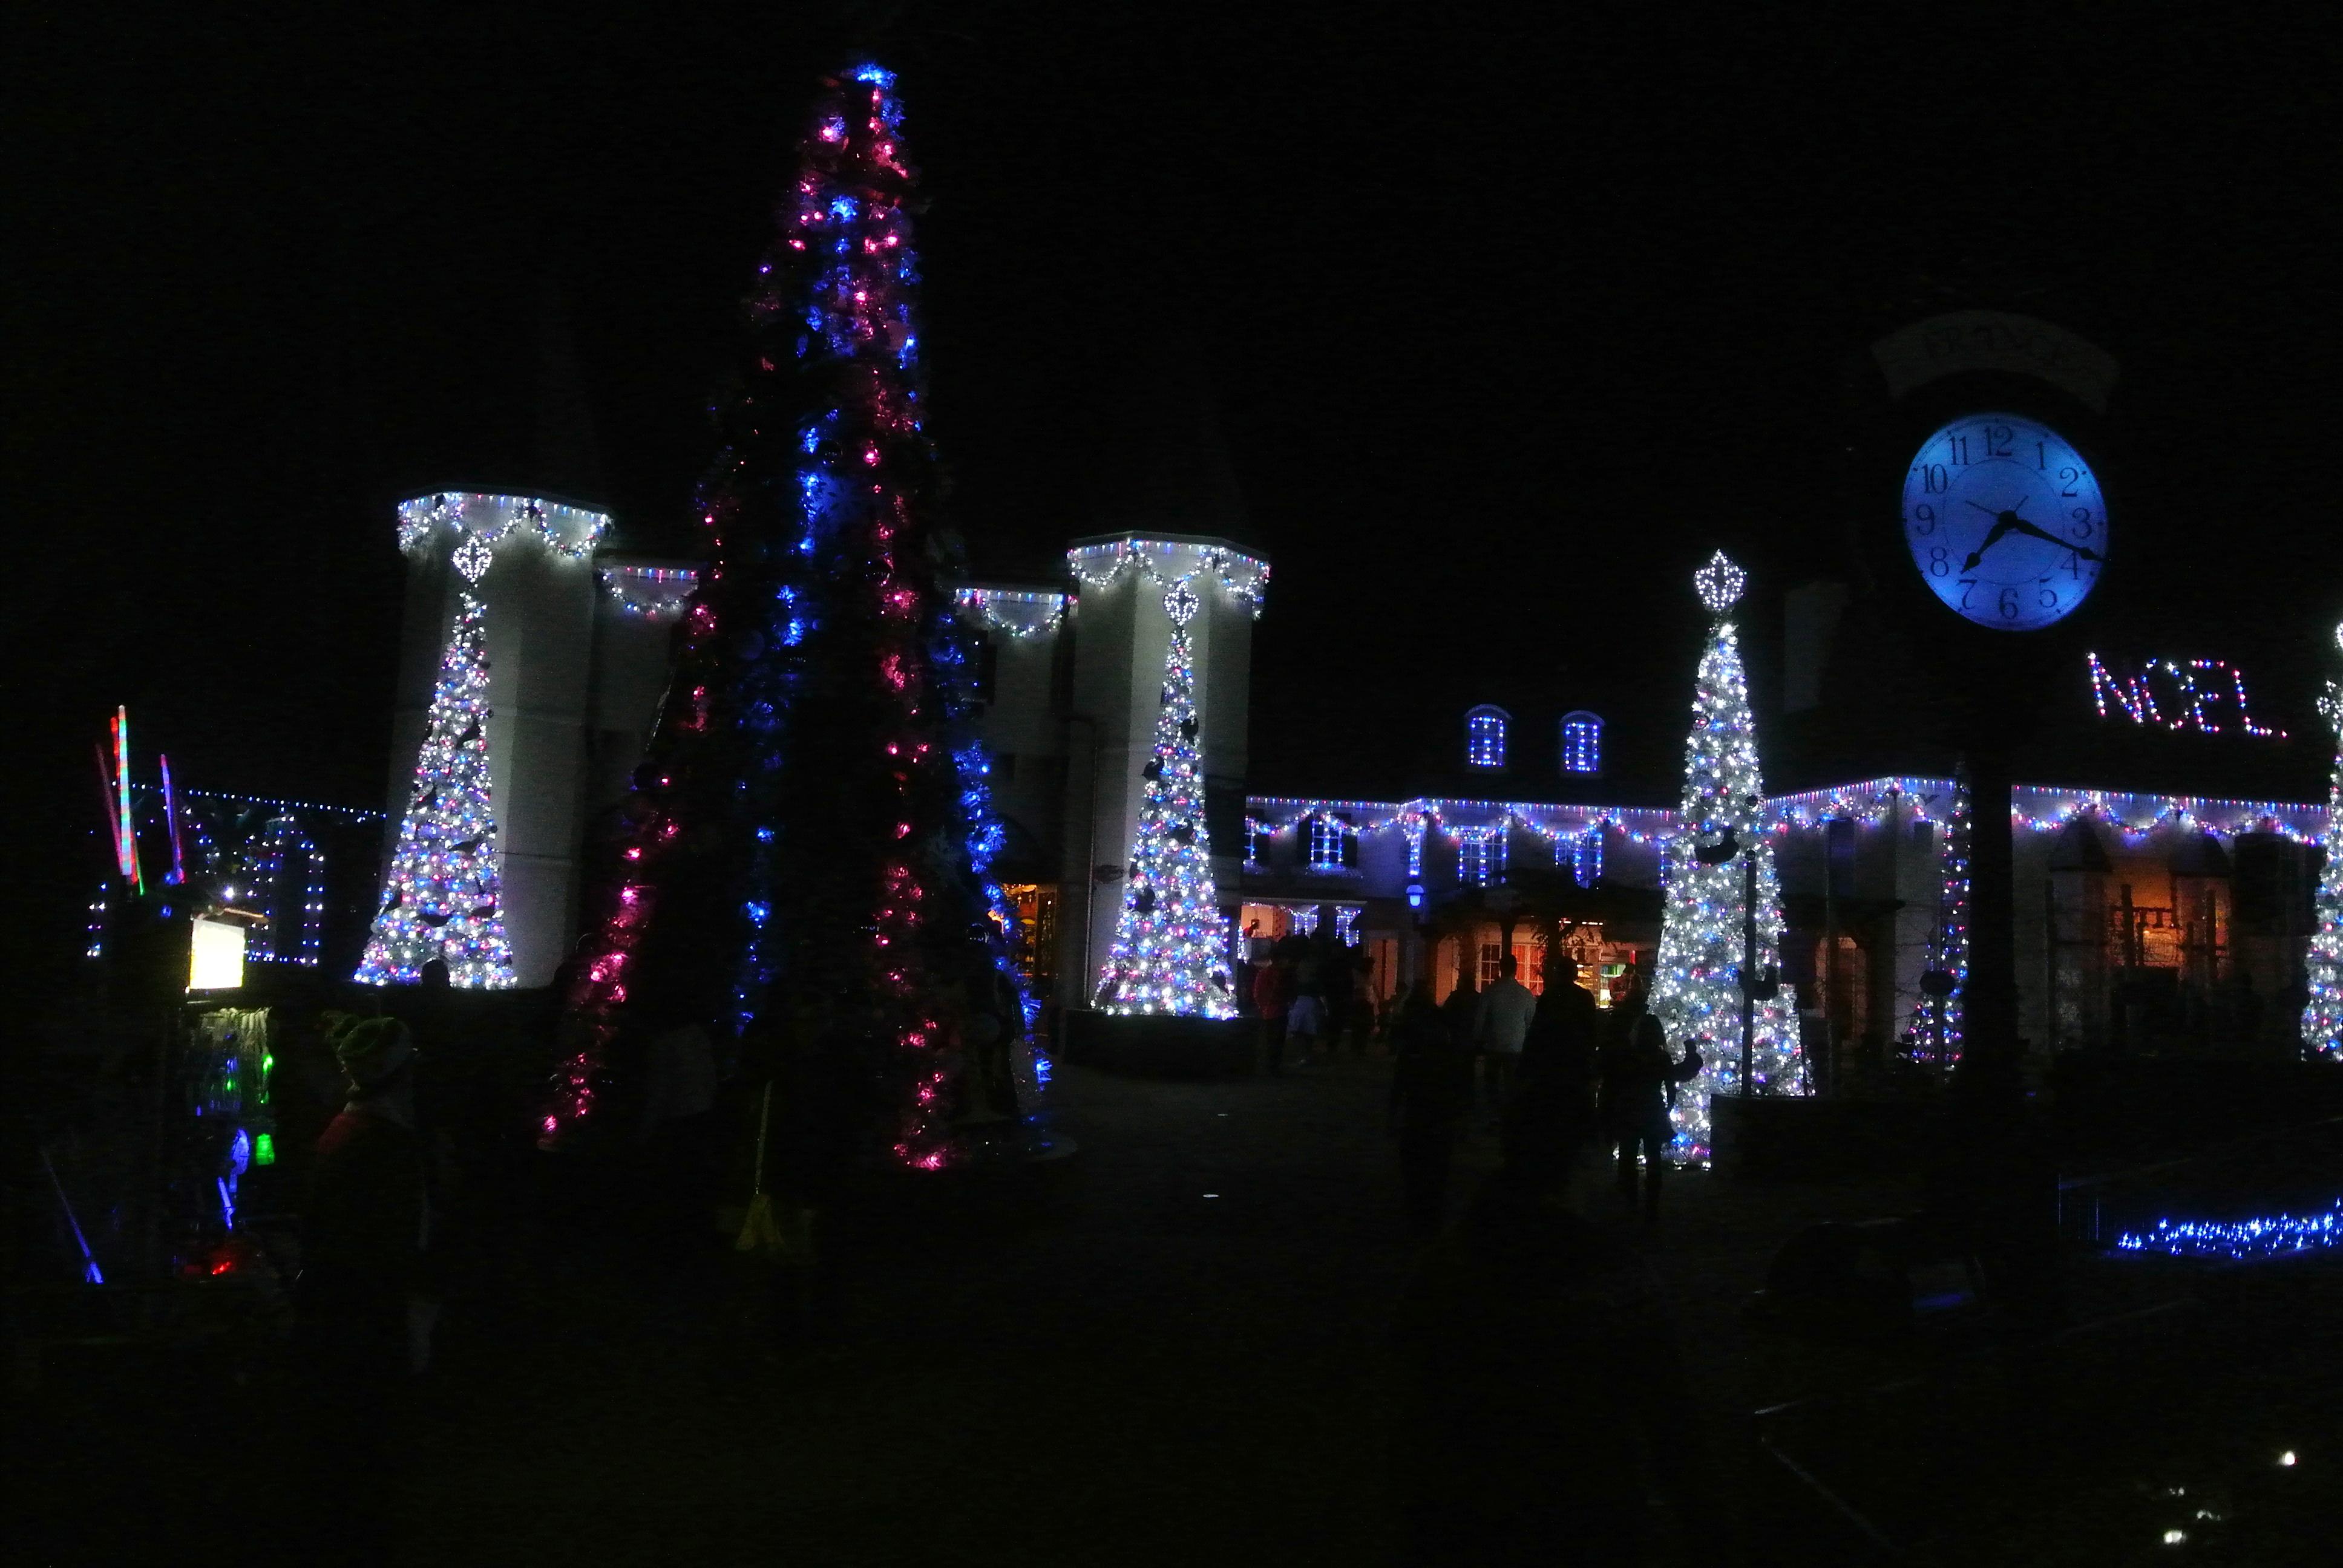 Sponsored Christmas Town At Busch Gardens Brings Joy